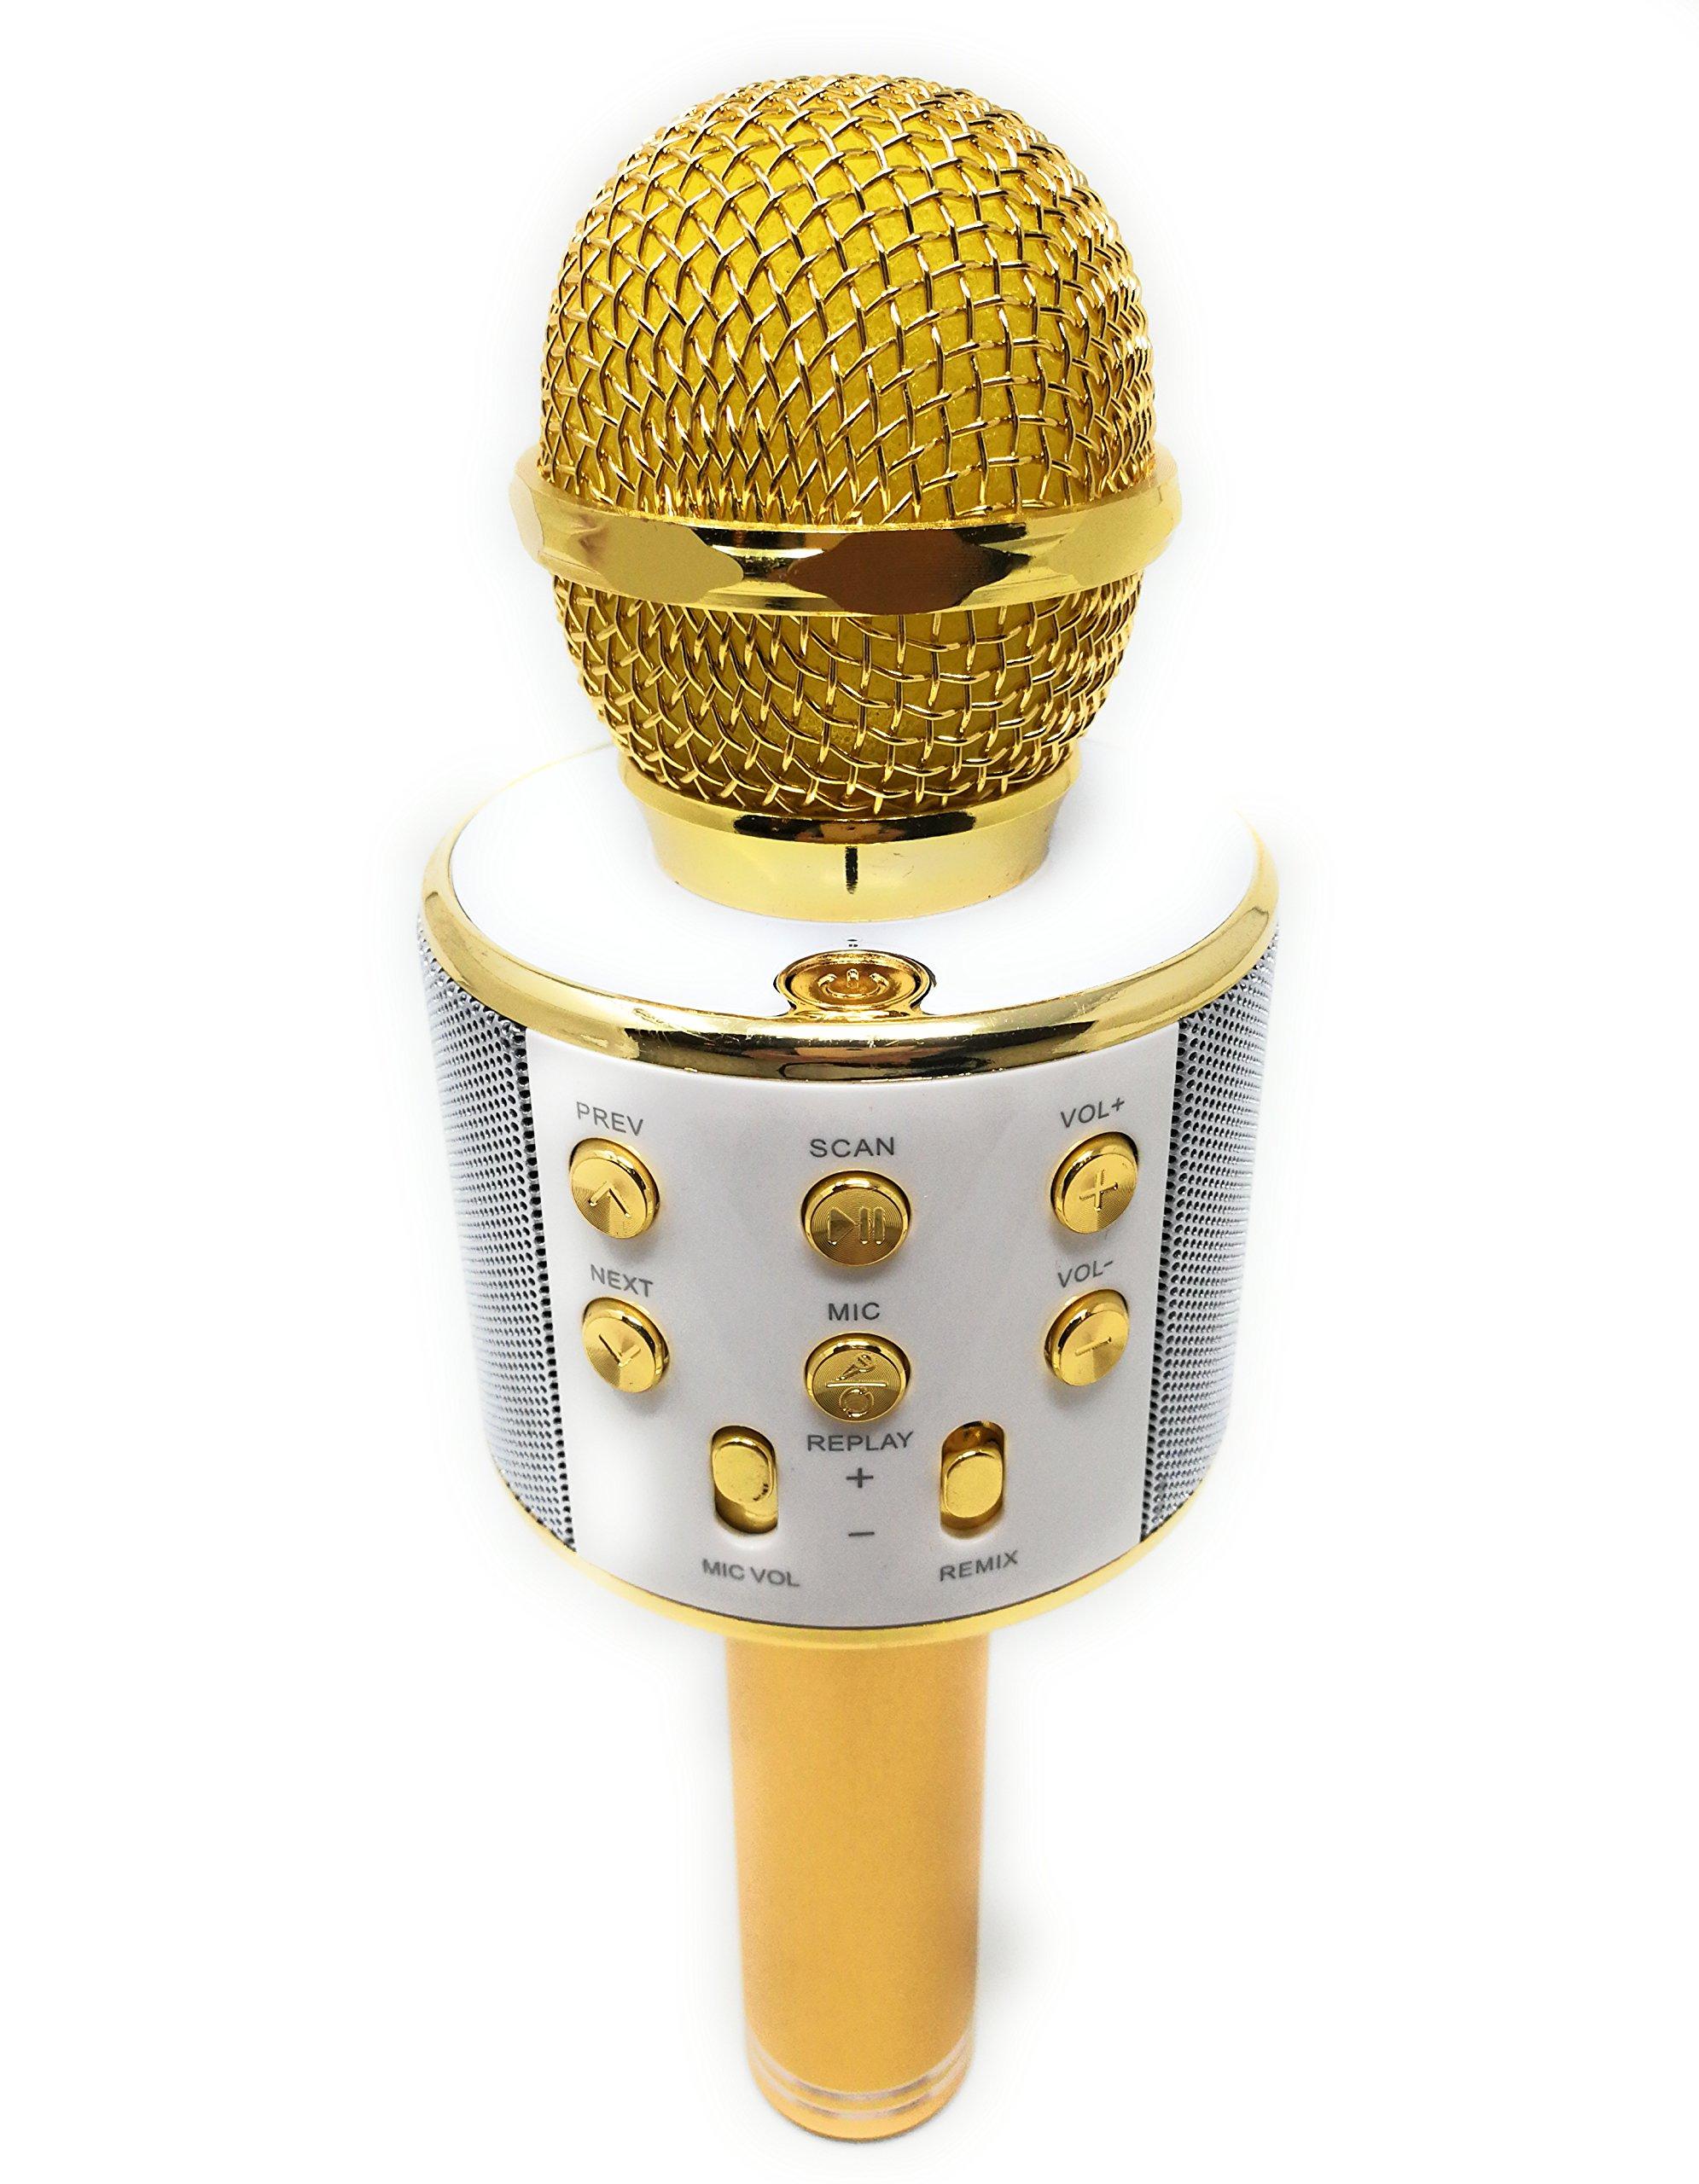 DLH MOBILE Portable Wireless Karaoke Microphone,Handheld Cellphone Karaoke Player Built-in Bluetooth HIFI Speaker, Selfie 3-in-1 Rechargeable Li-battery Karaoke KTV MIC Machine Gold (WS858) by DLH MOBILE (Image #1)